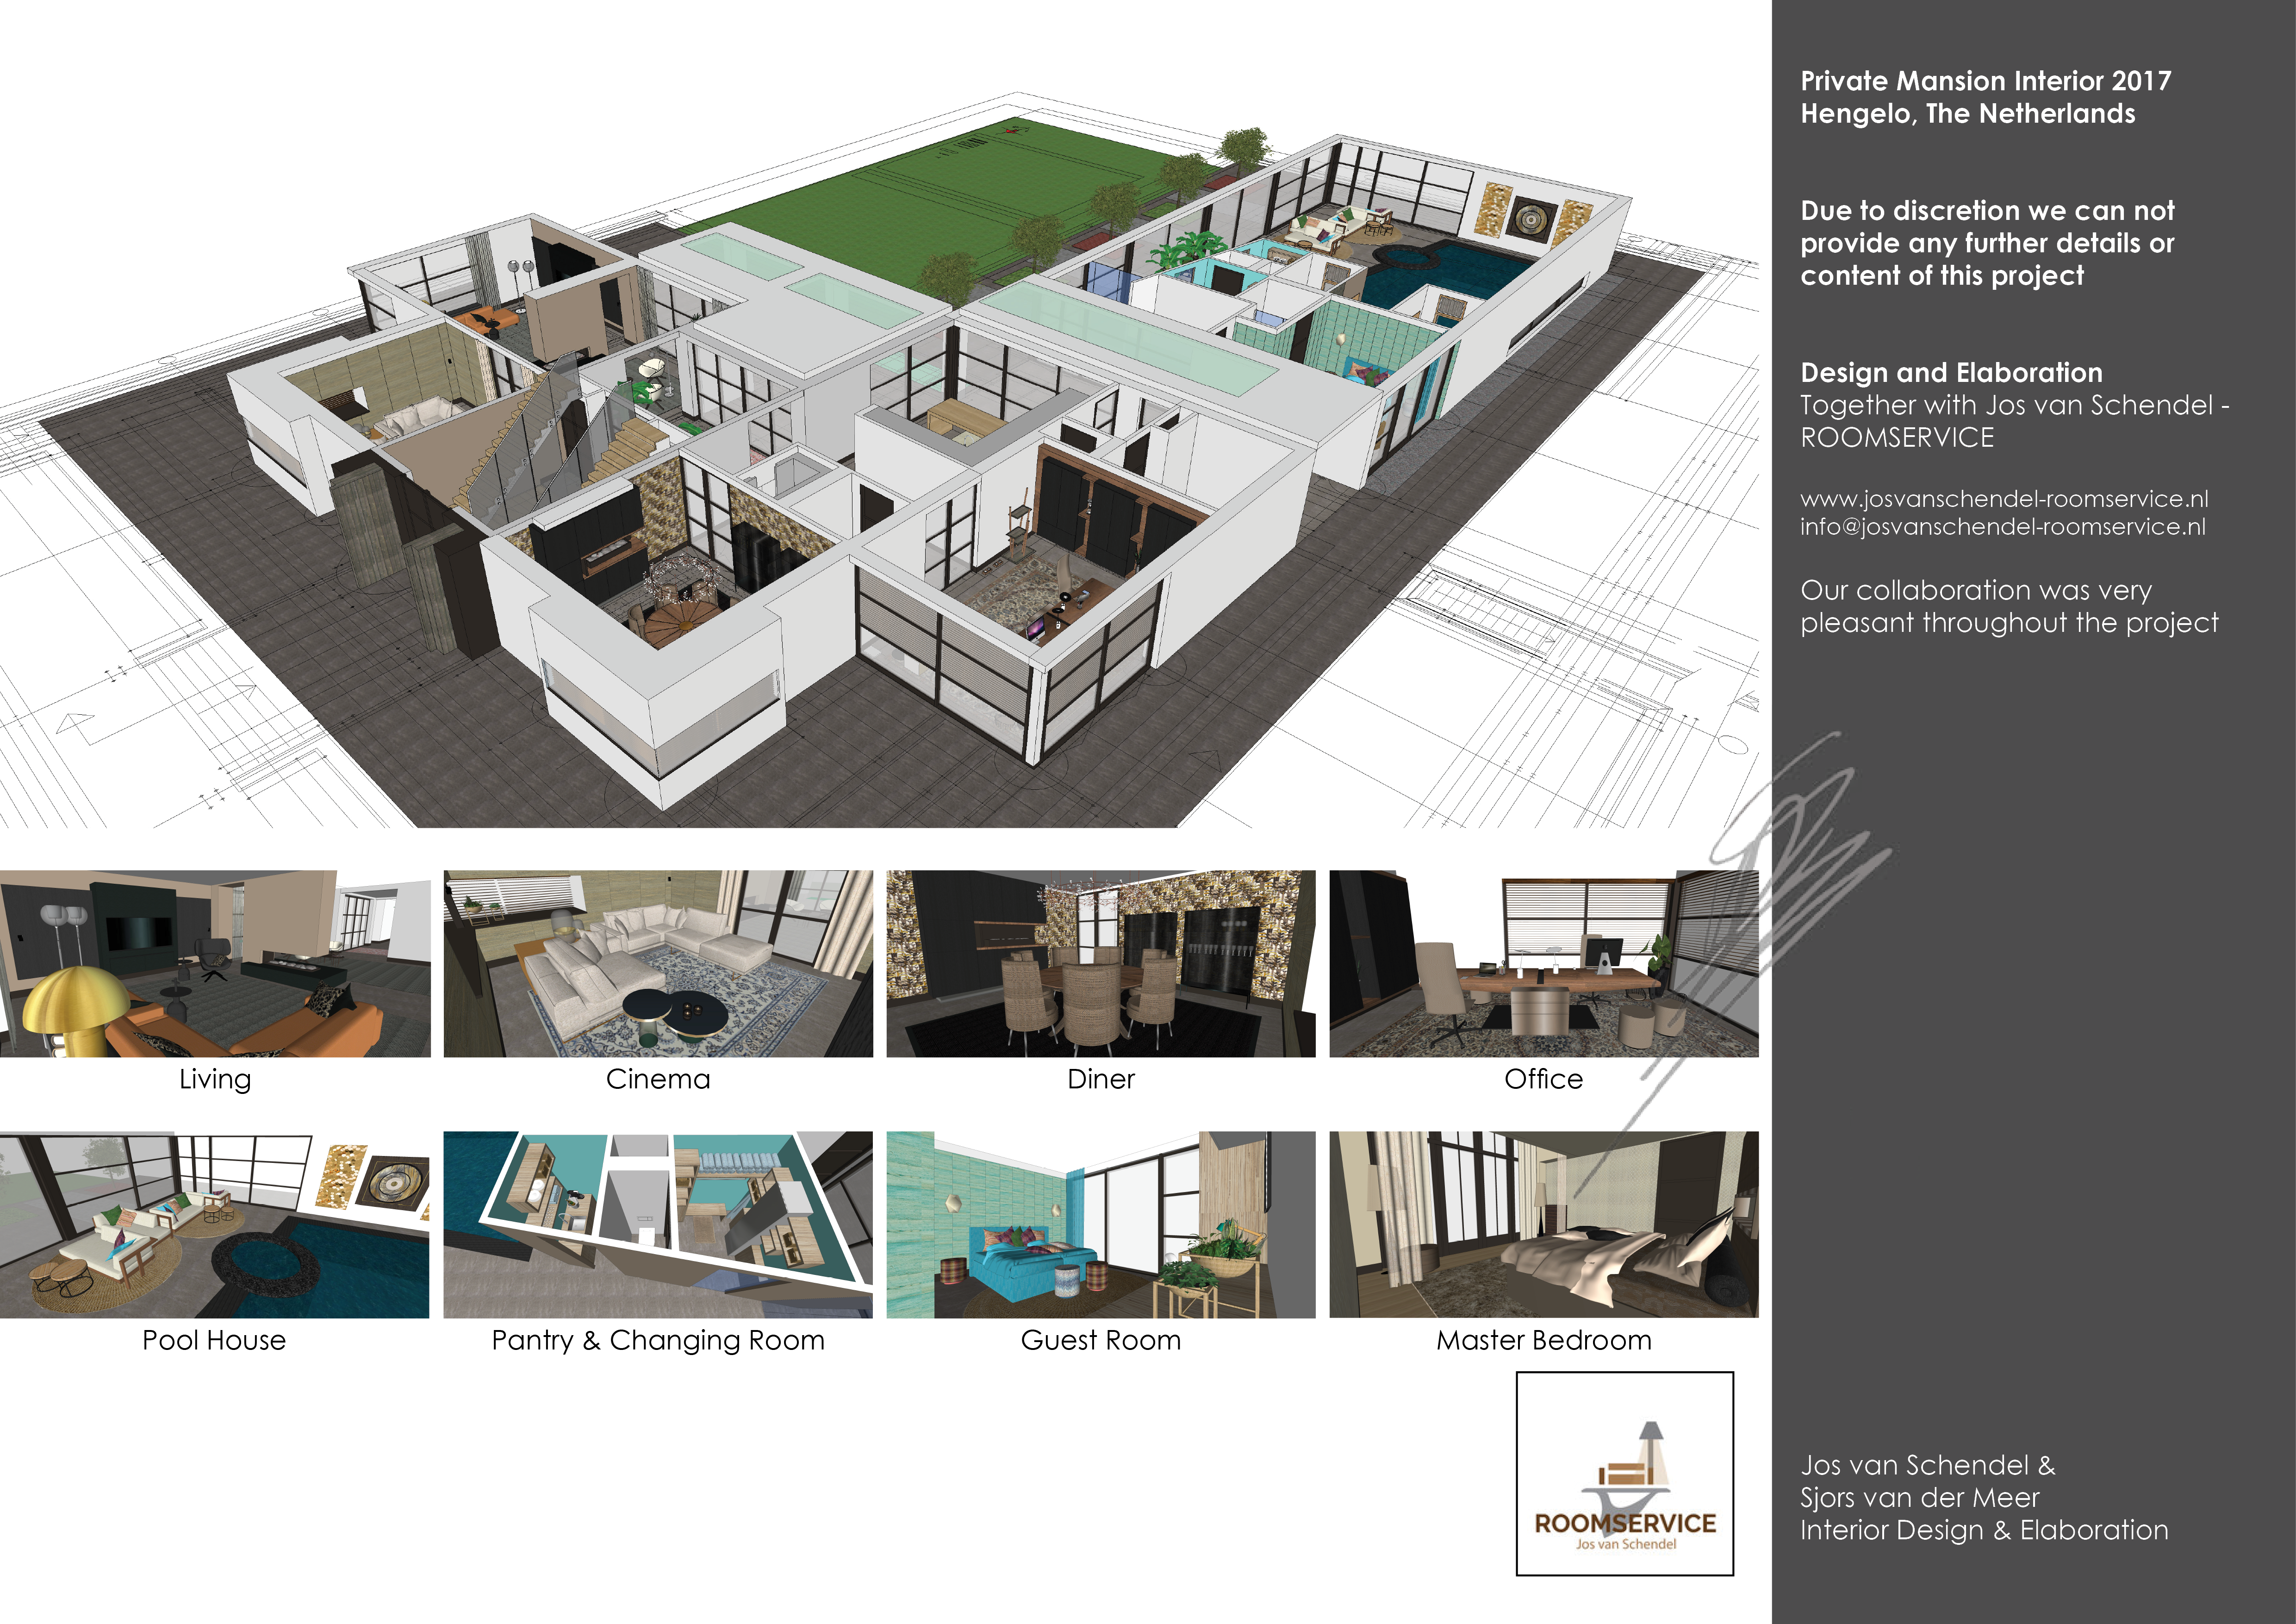 Portfolio Private Mansion Hengelo